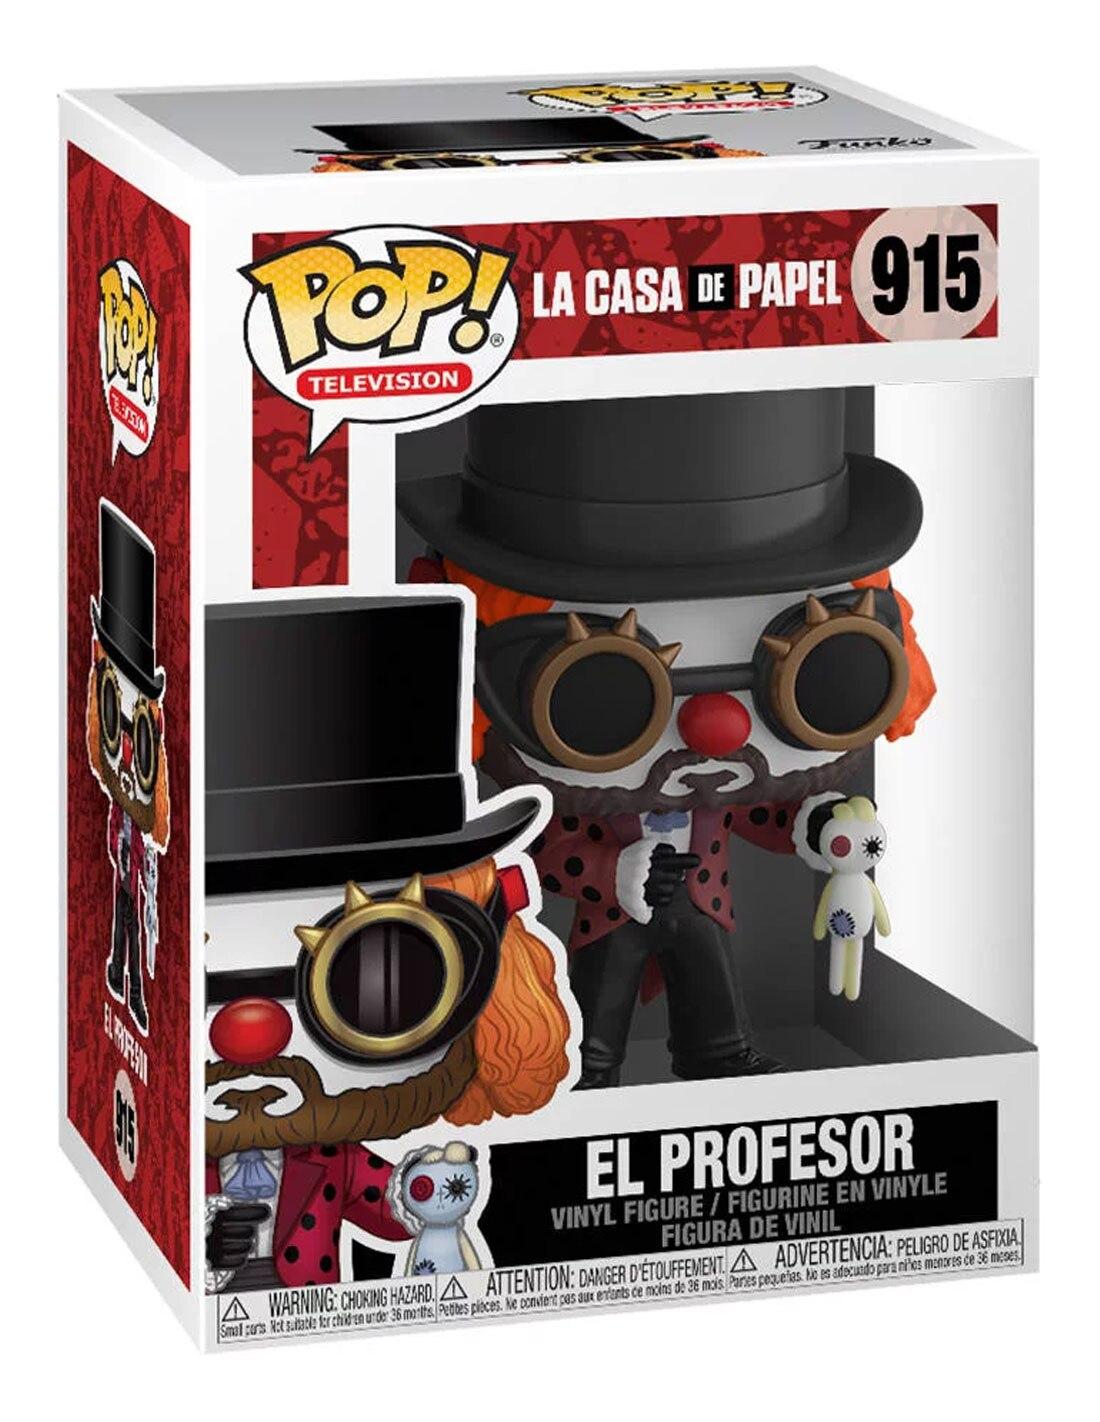 El profesor figure pop